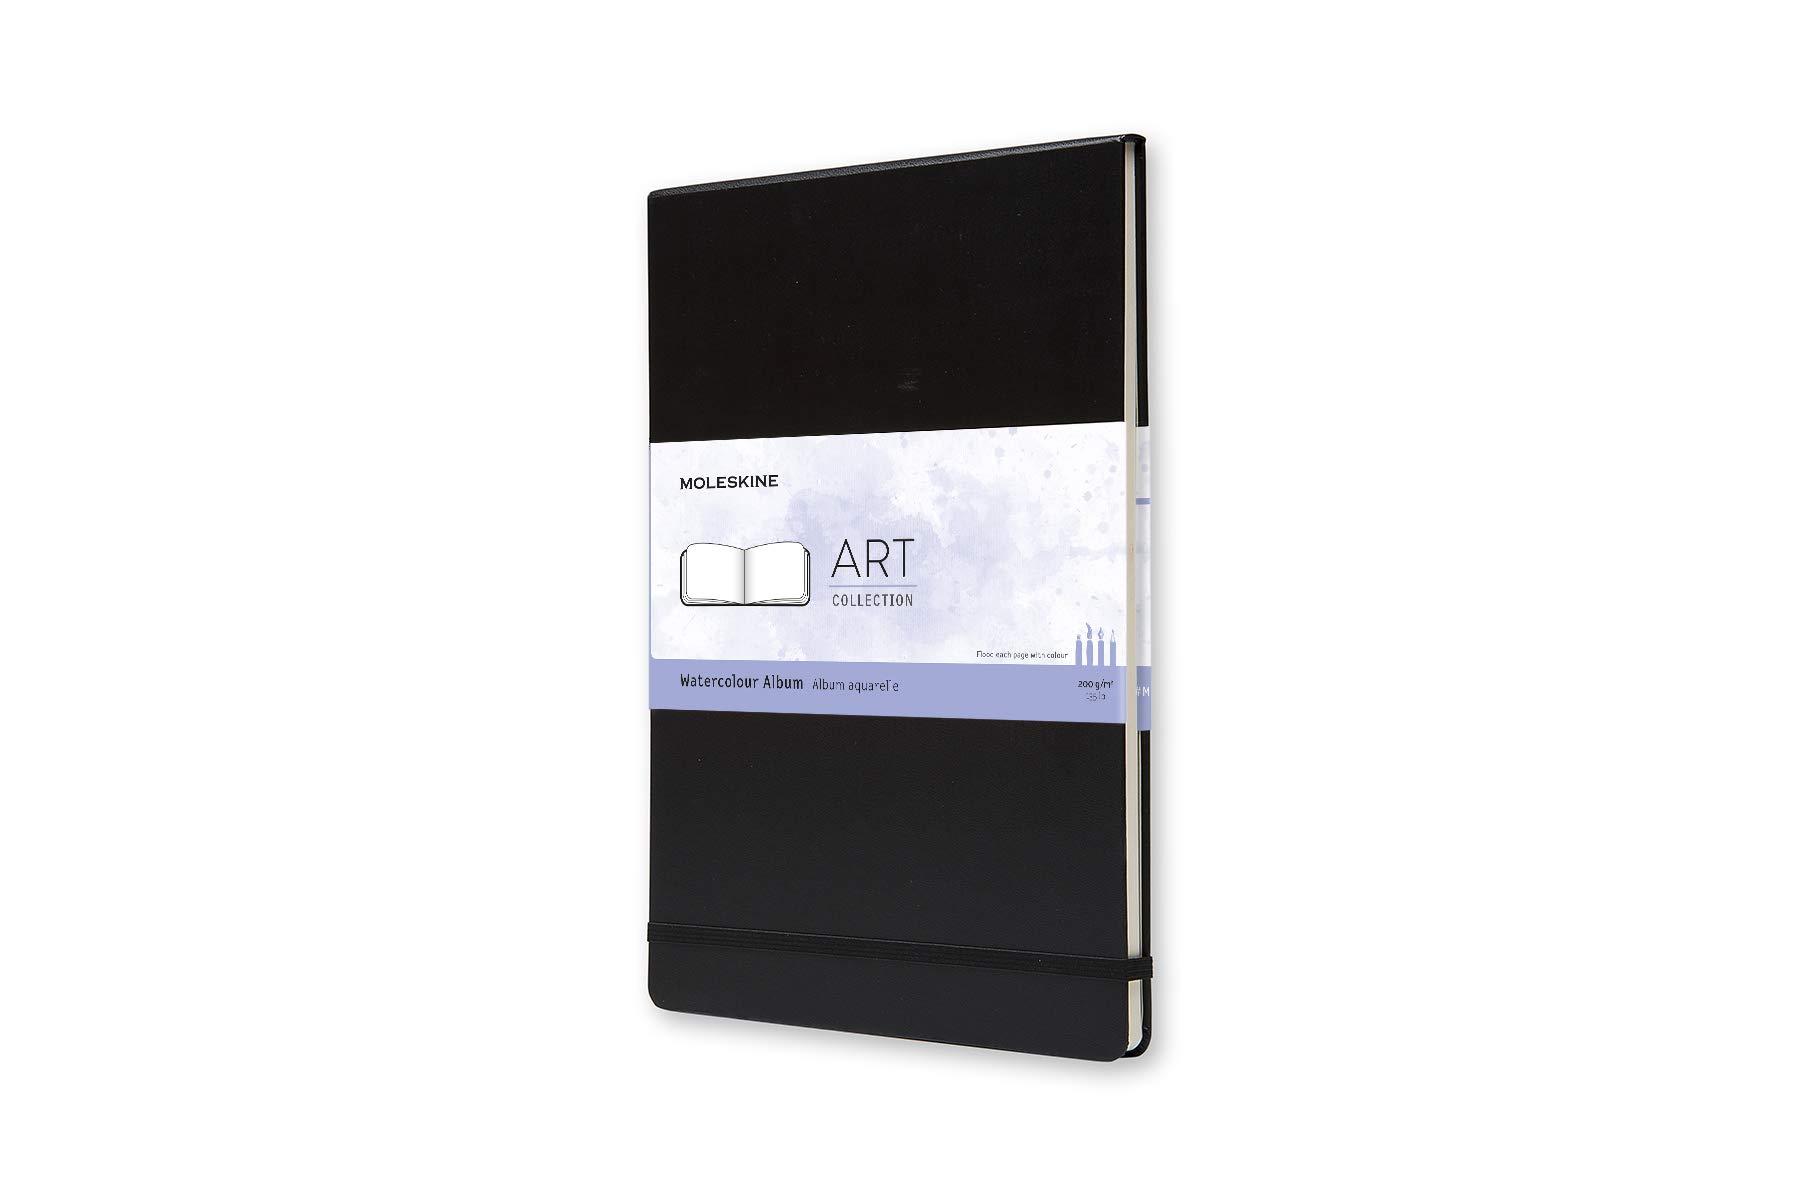 Moleskine Art Watercolor Album, Hard Cover, A4 (8.25'' x 11.75'') Plain/Blank, Black by Moleskine